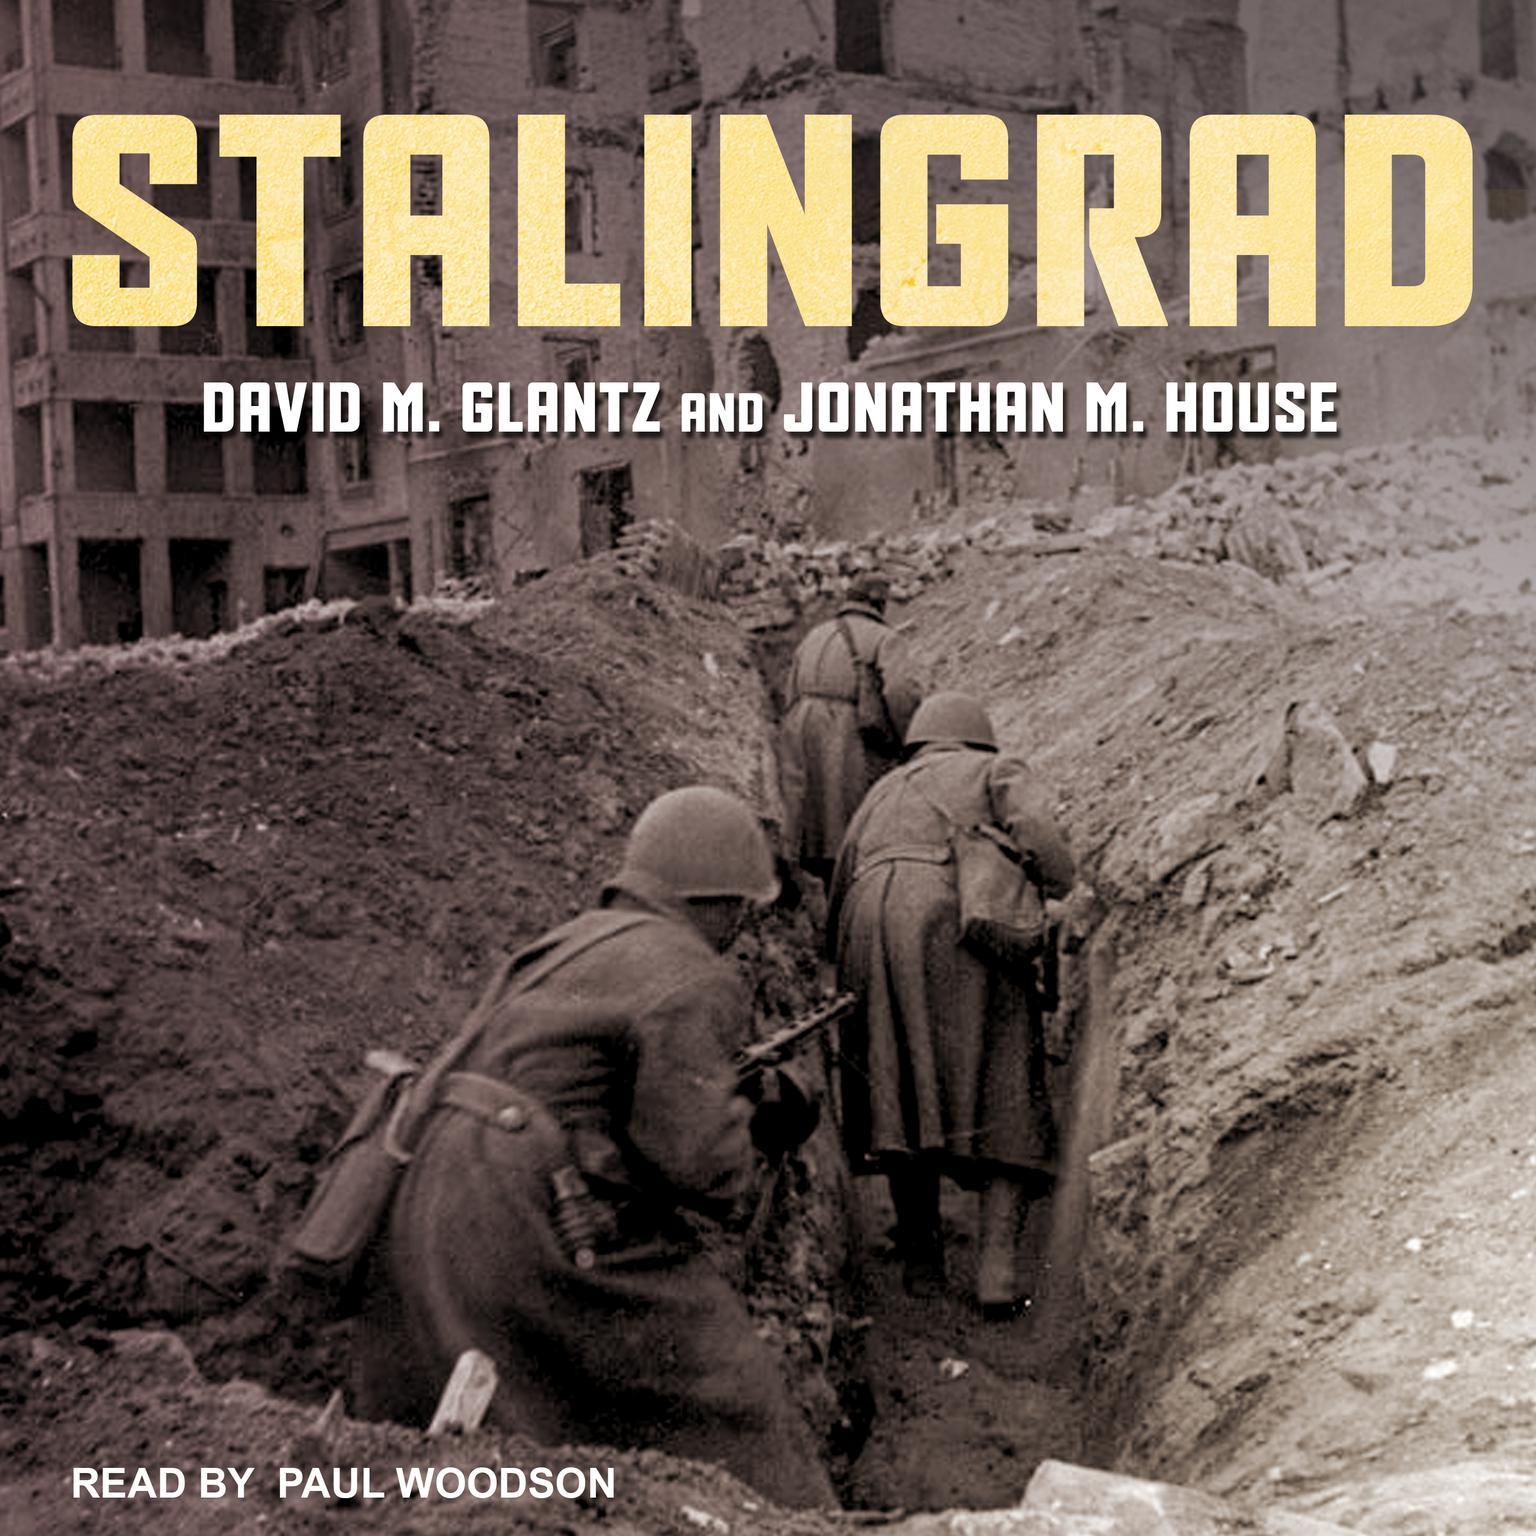 Stalingrad (Abridged) Audiobook, by David M. Glantz